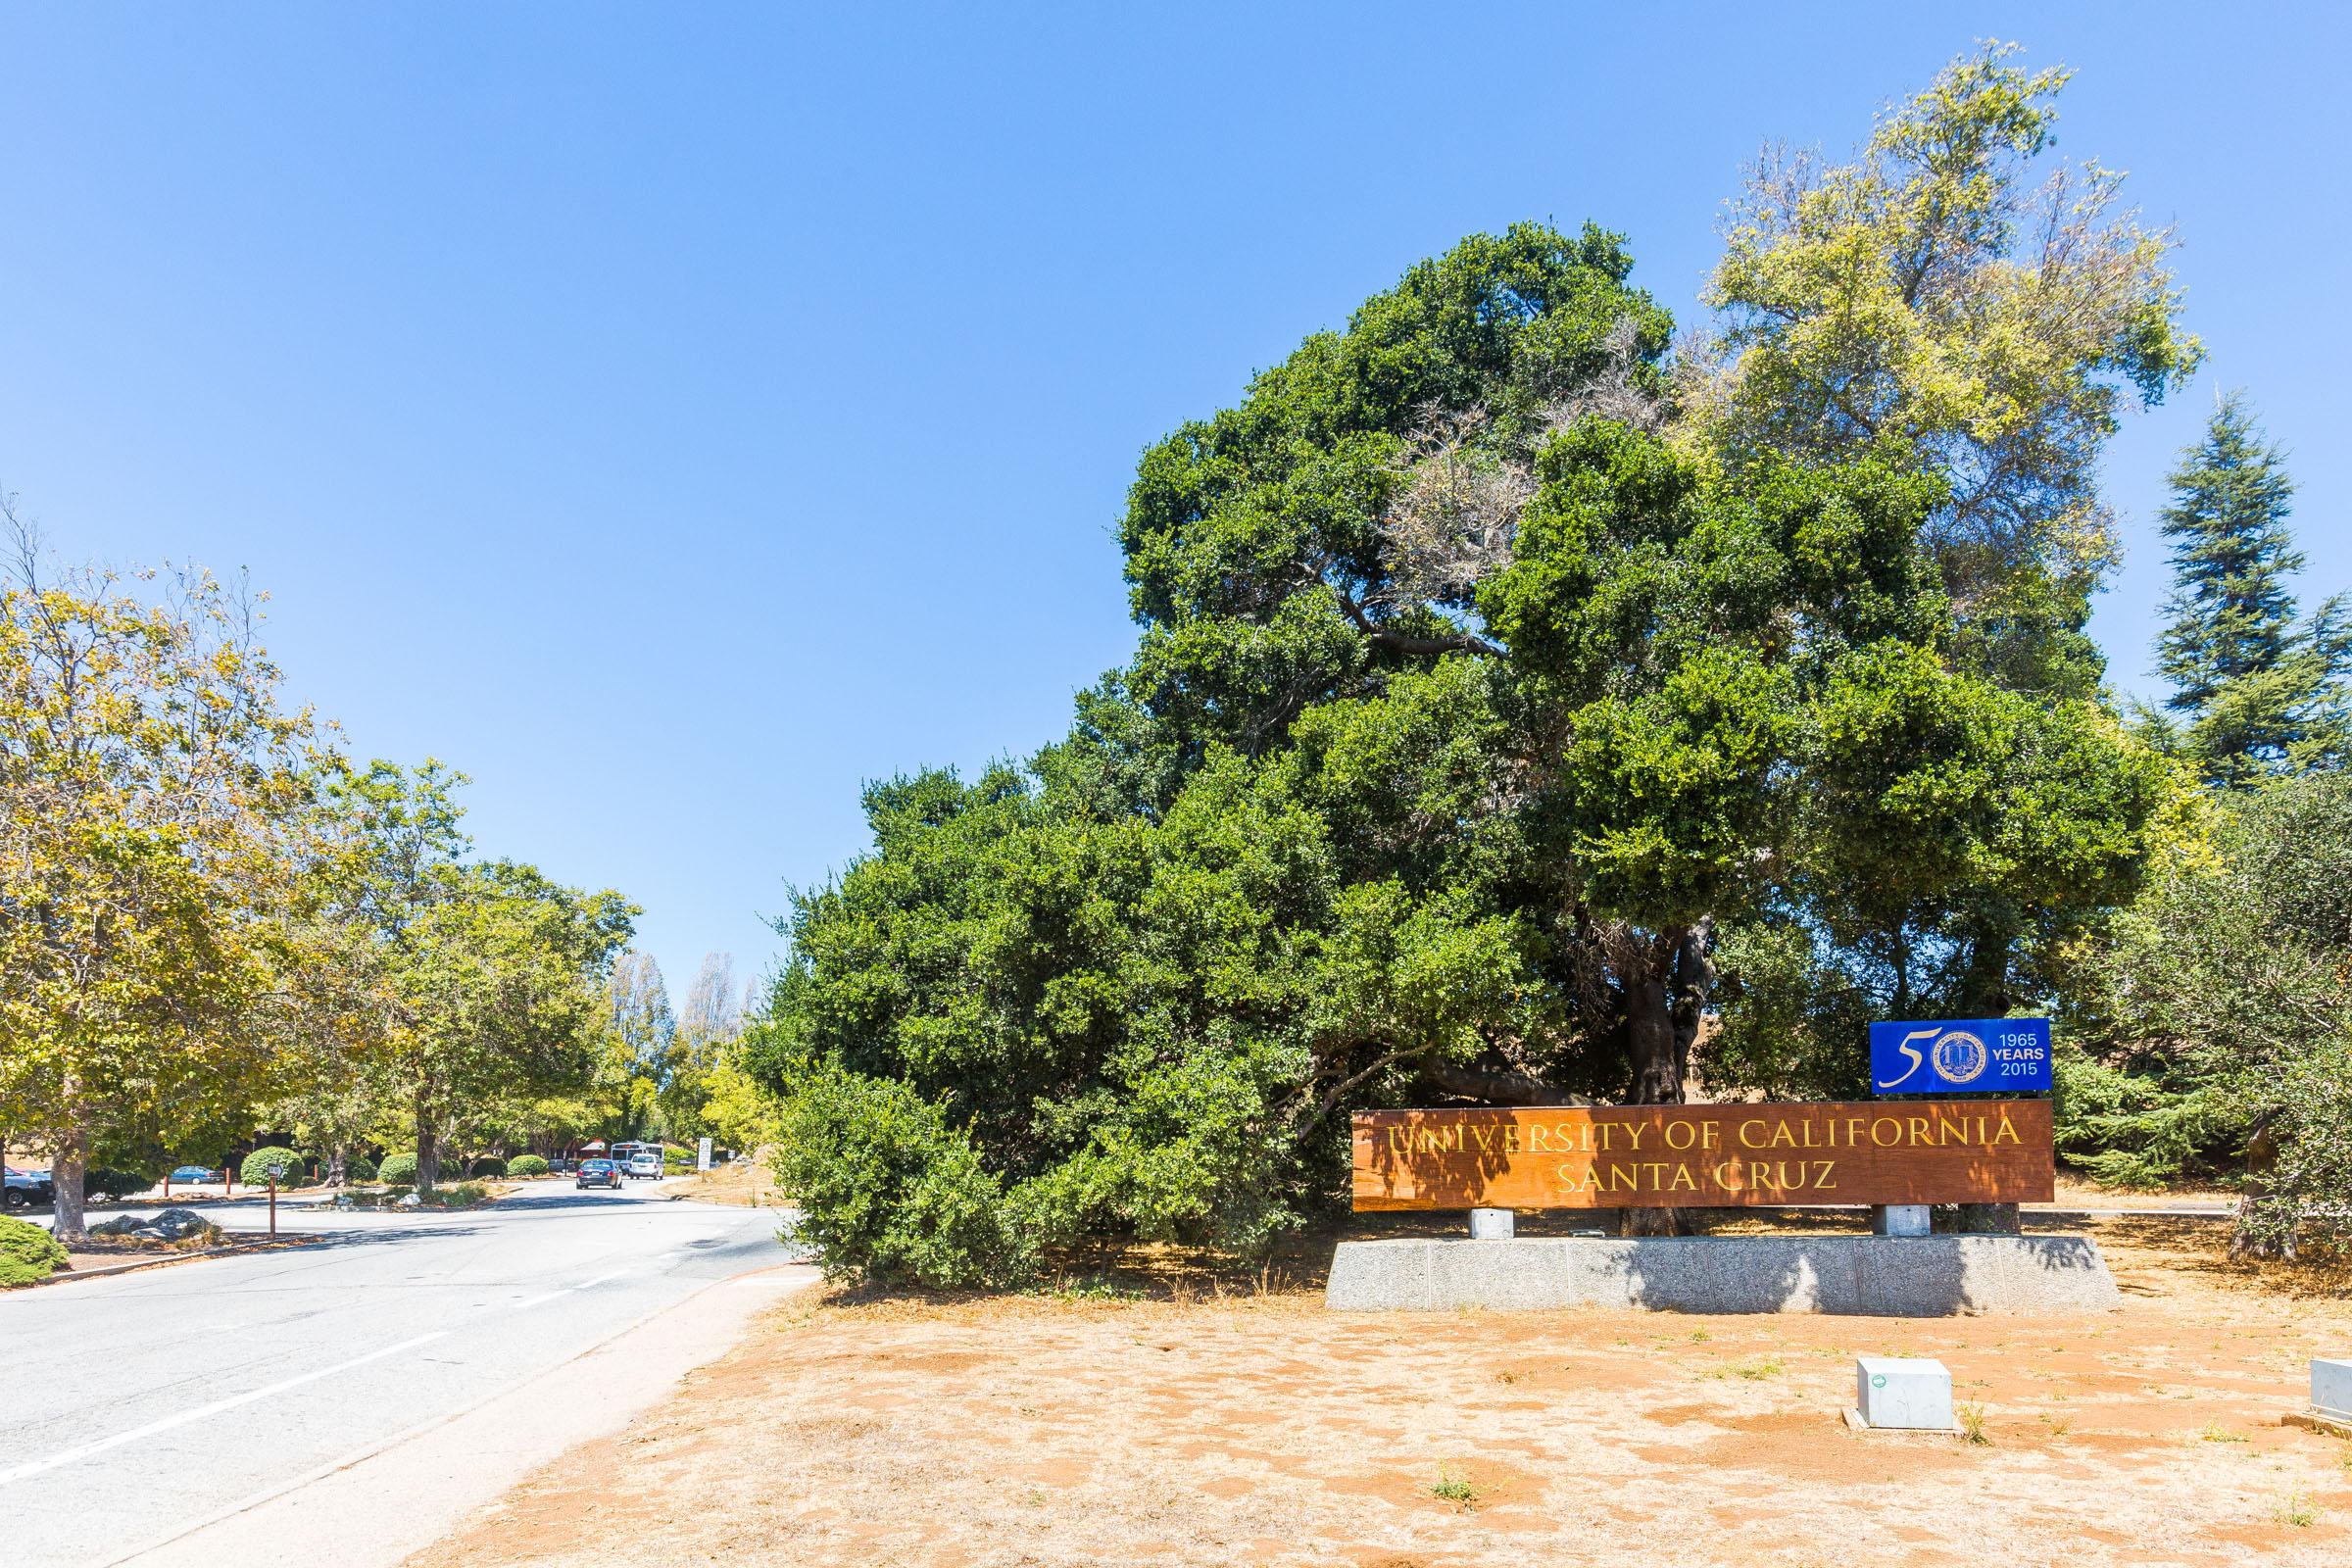 University of California Santa Cruz | UCSC